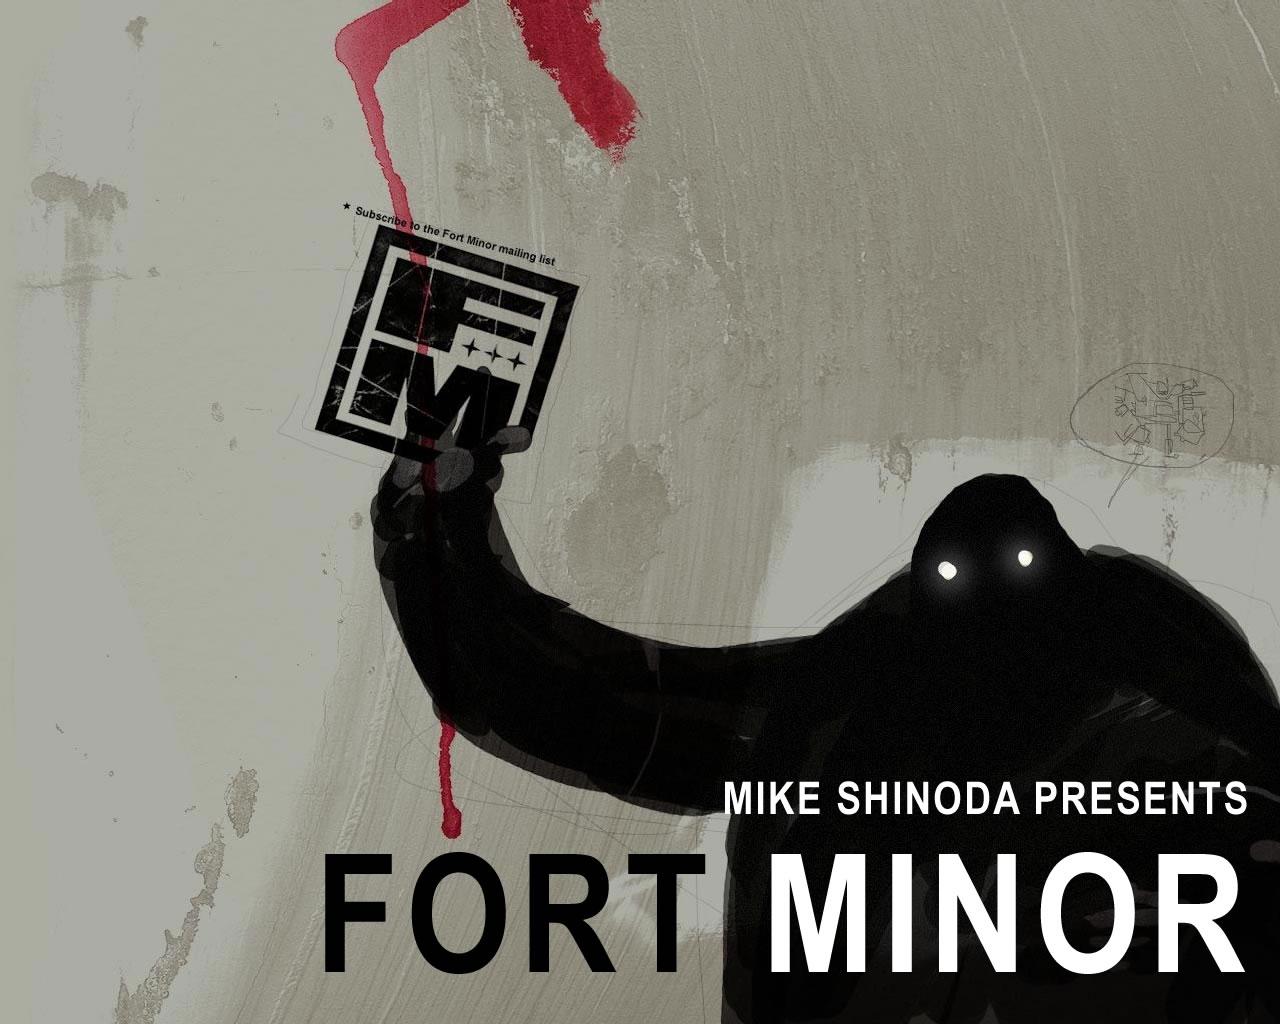 Fort Minor